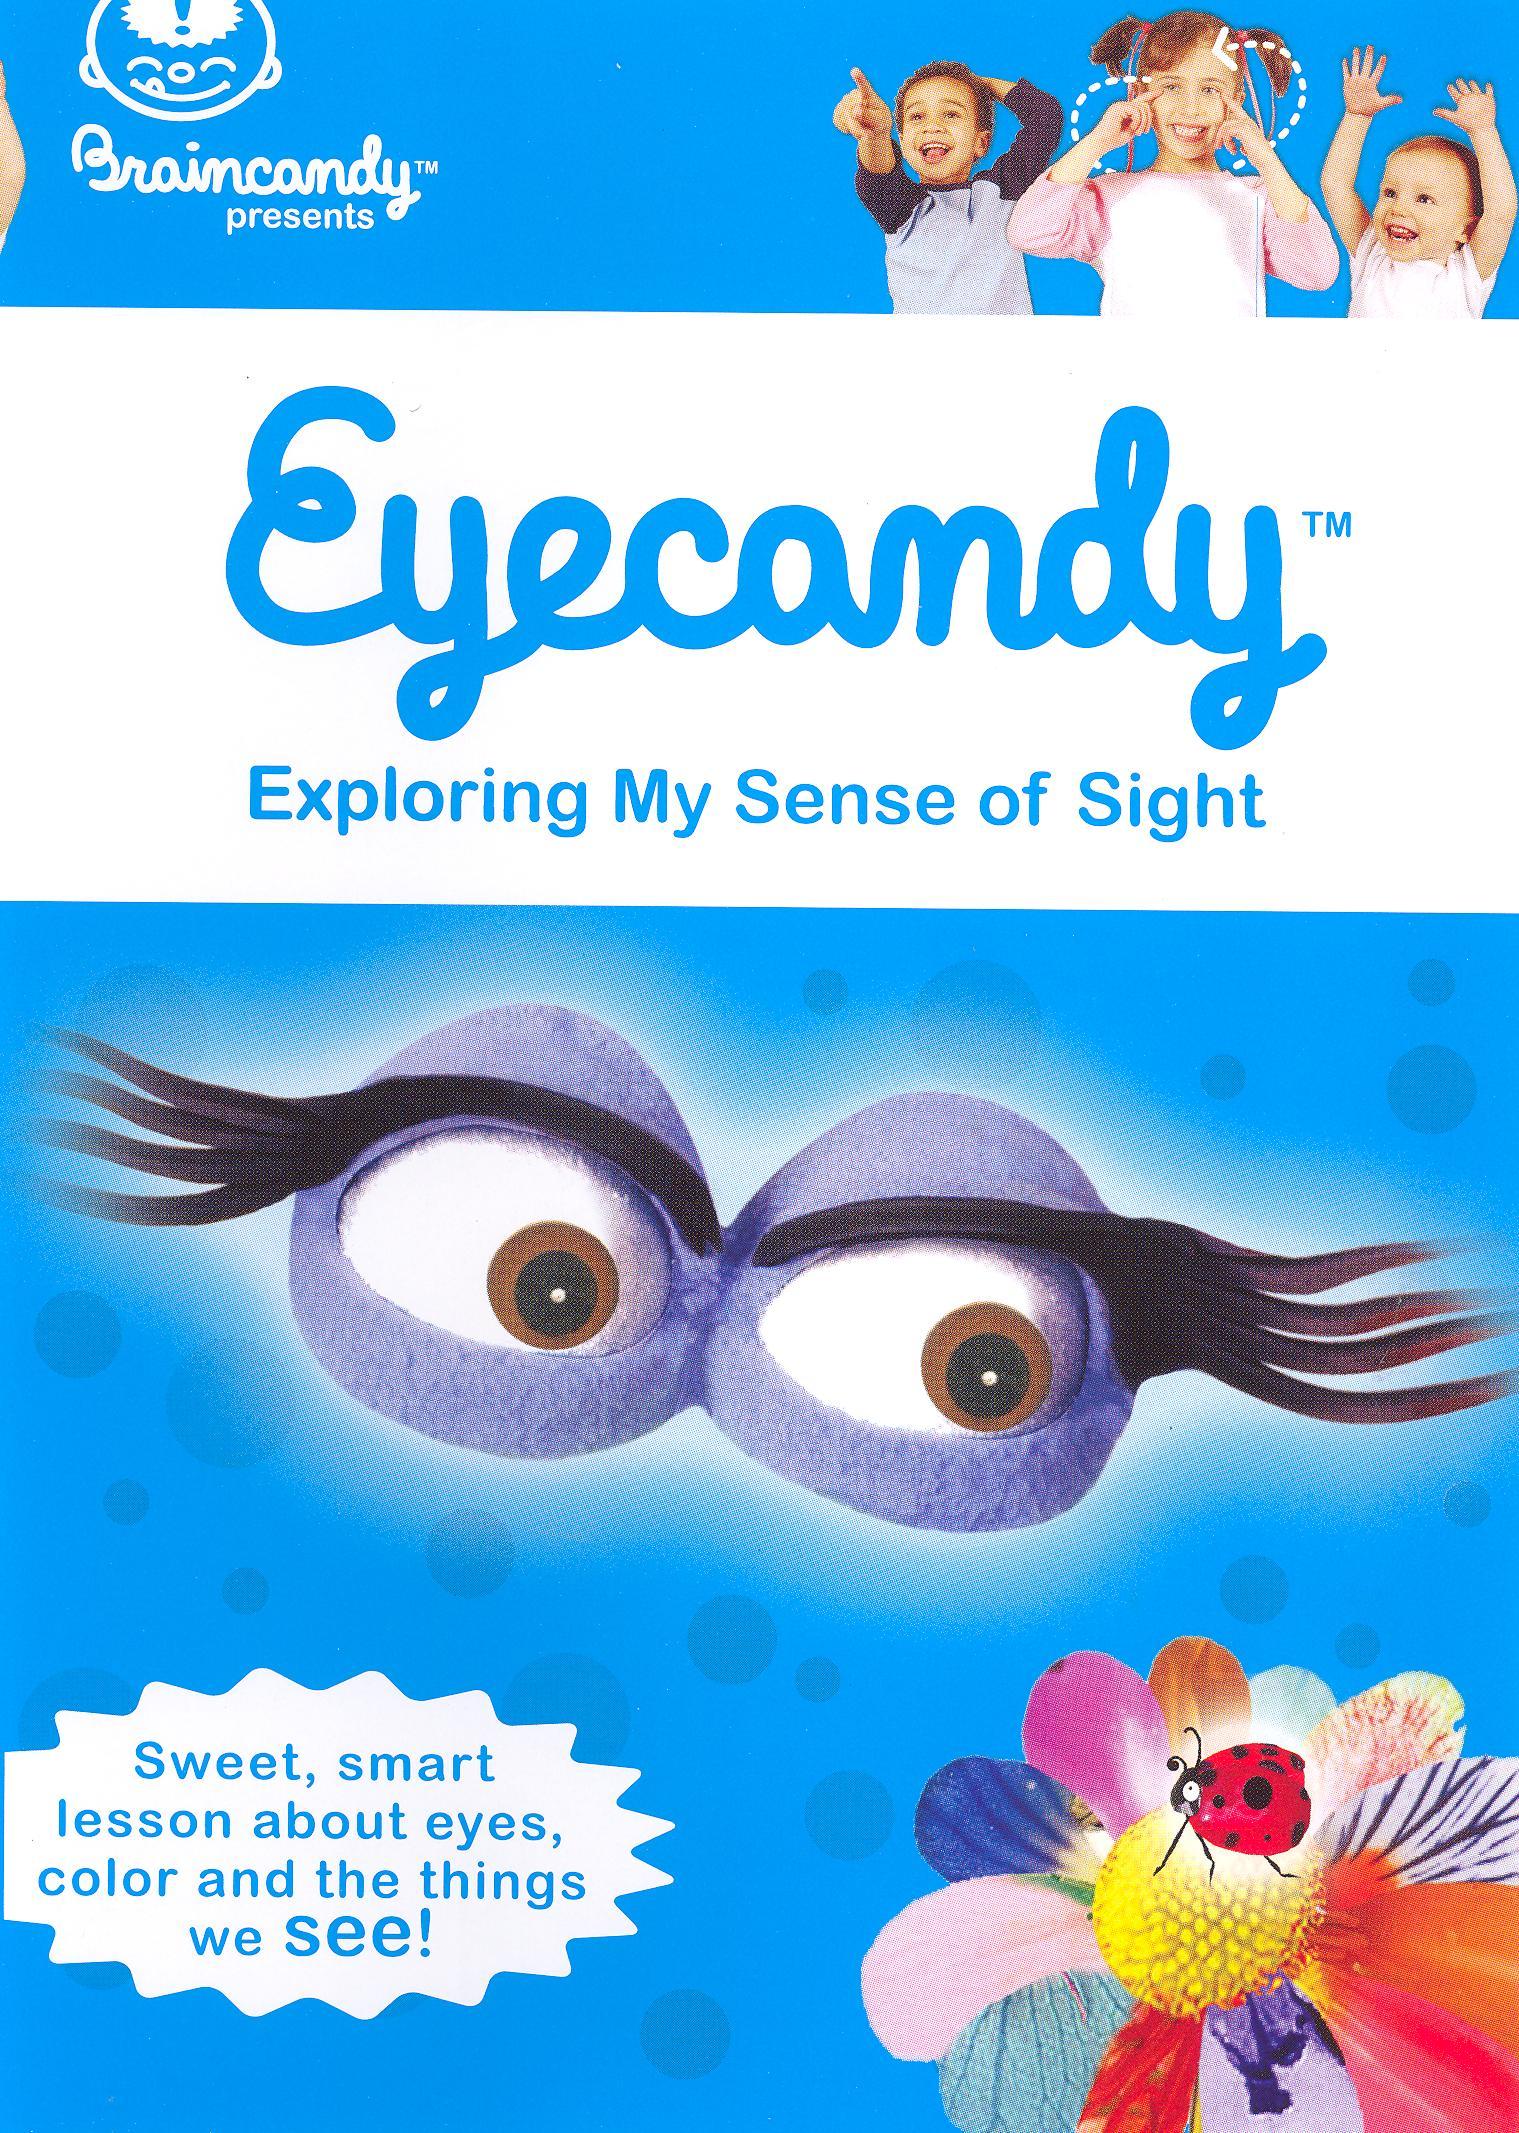 Eyecandy: Exploring My Sense of Sight